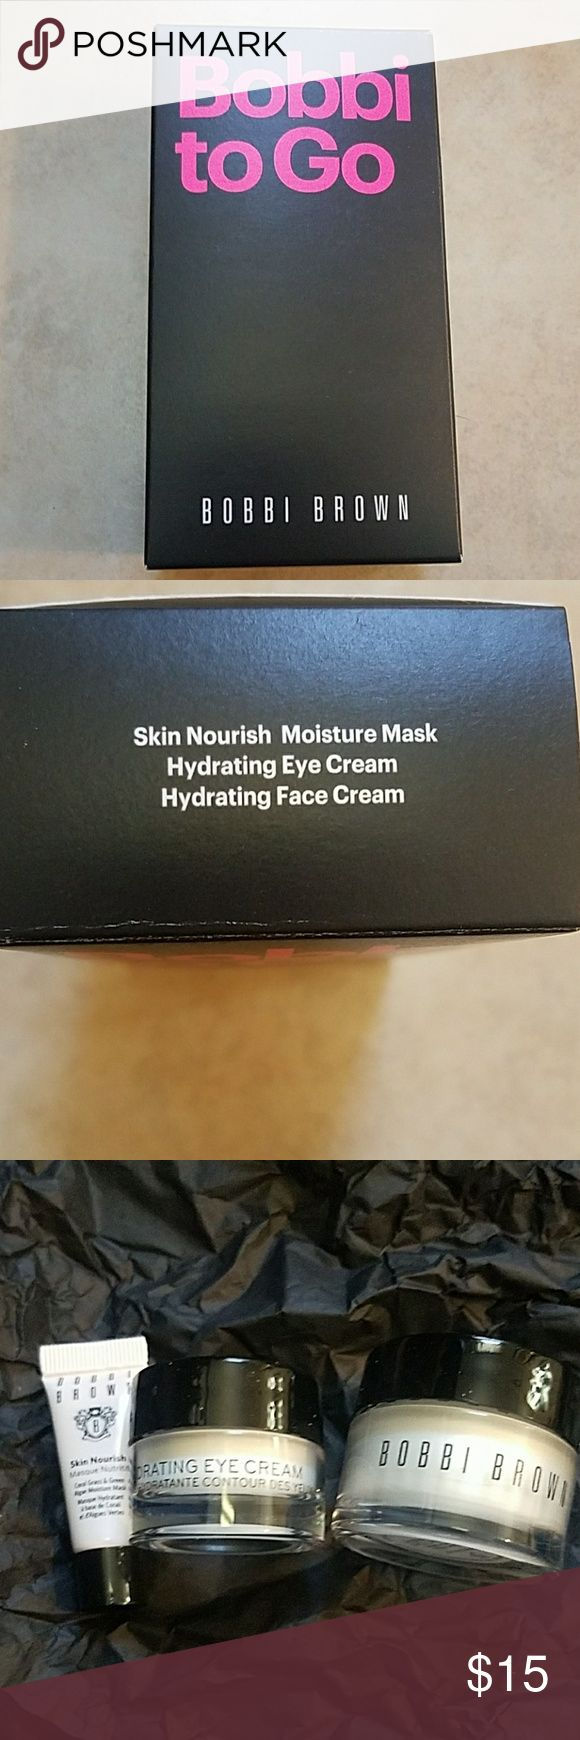 Bobbi to Go Mini skin nourish mask, hydrating eye cream, hydrating face cream Bobbi Brown Makeup